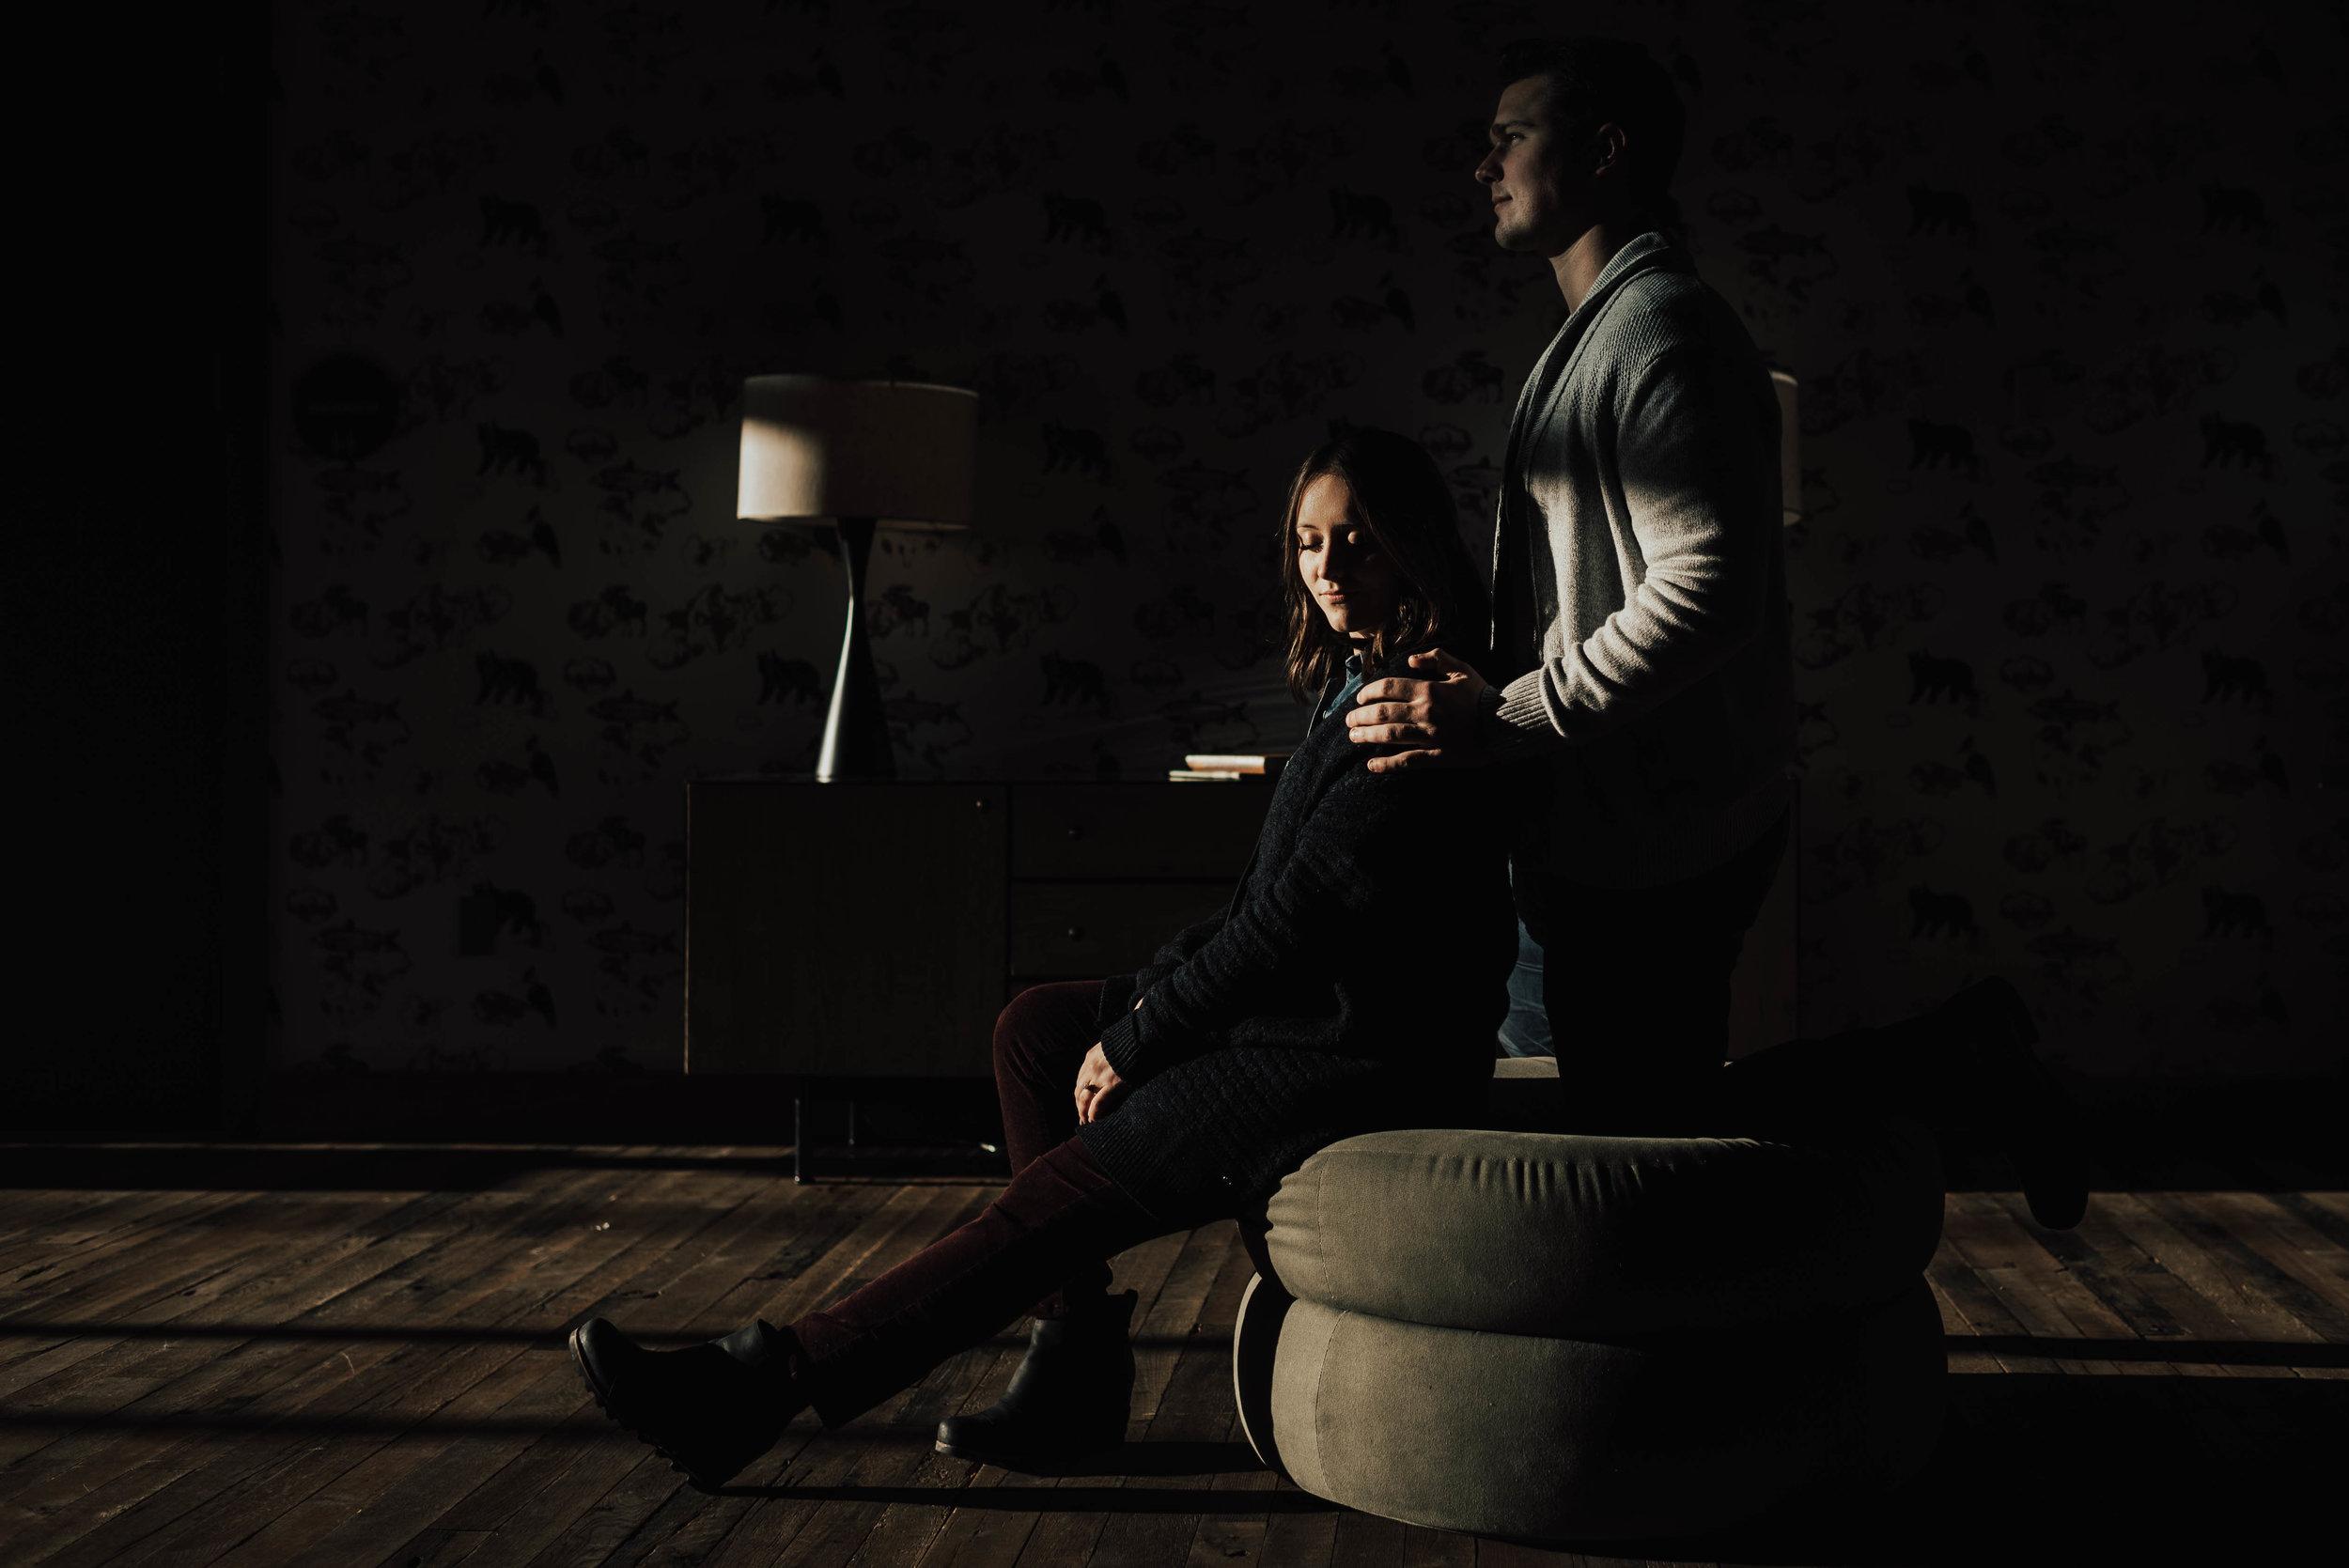 Steena-Anne-Photography-Samantha-Josh-Minneapolis-Winter-Engagement168.jpg